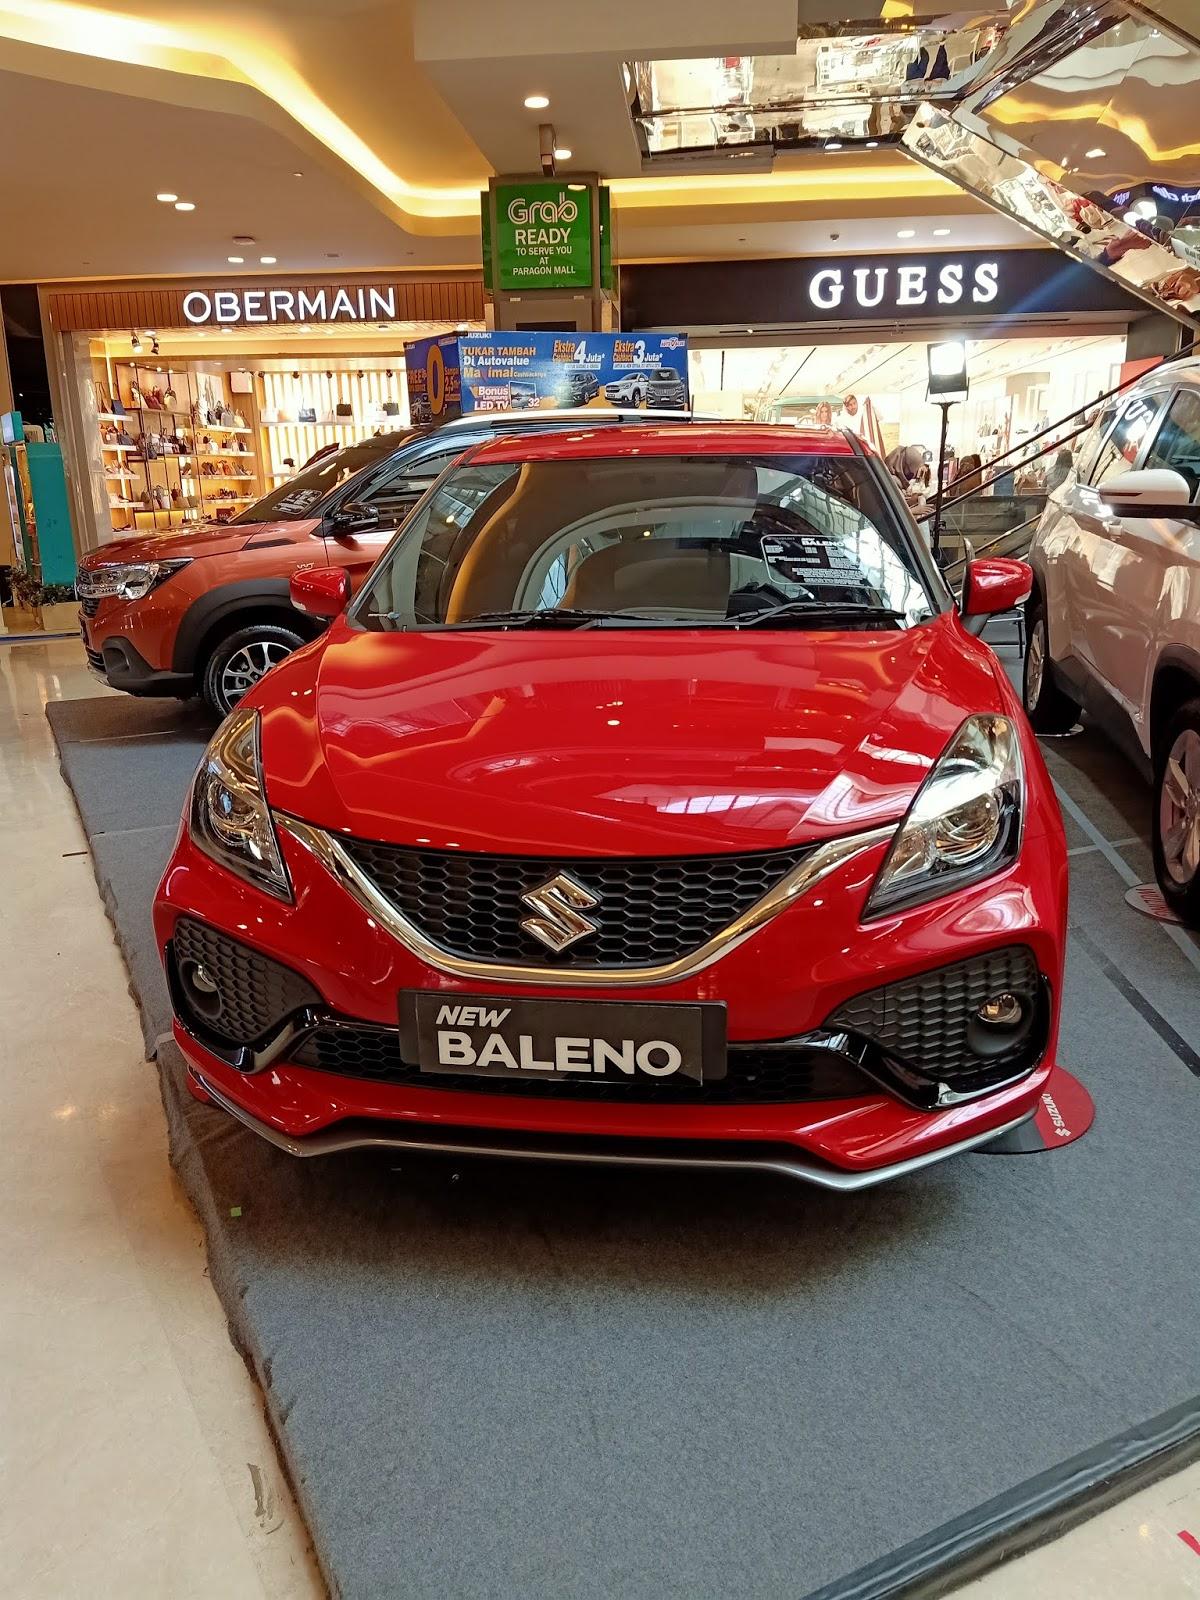 Pameran Mobil Suzuki Semarang